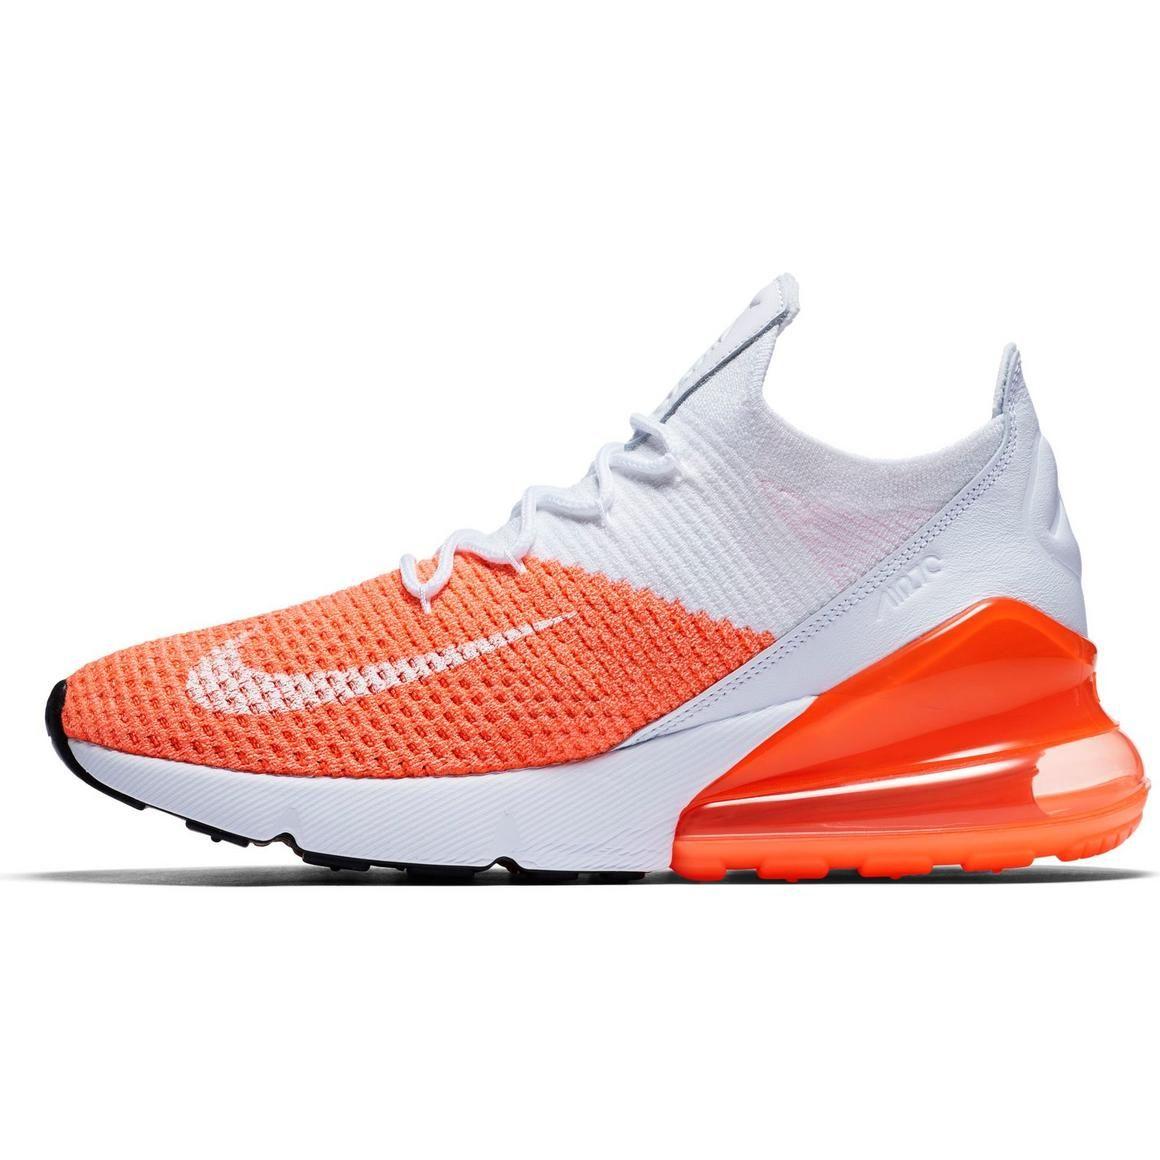 "Nike Air Max 270 Flyknit ""Crimson Pulse"" Women's Shoe"